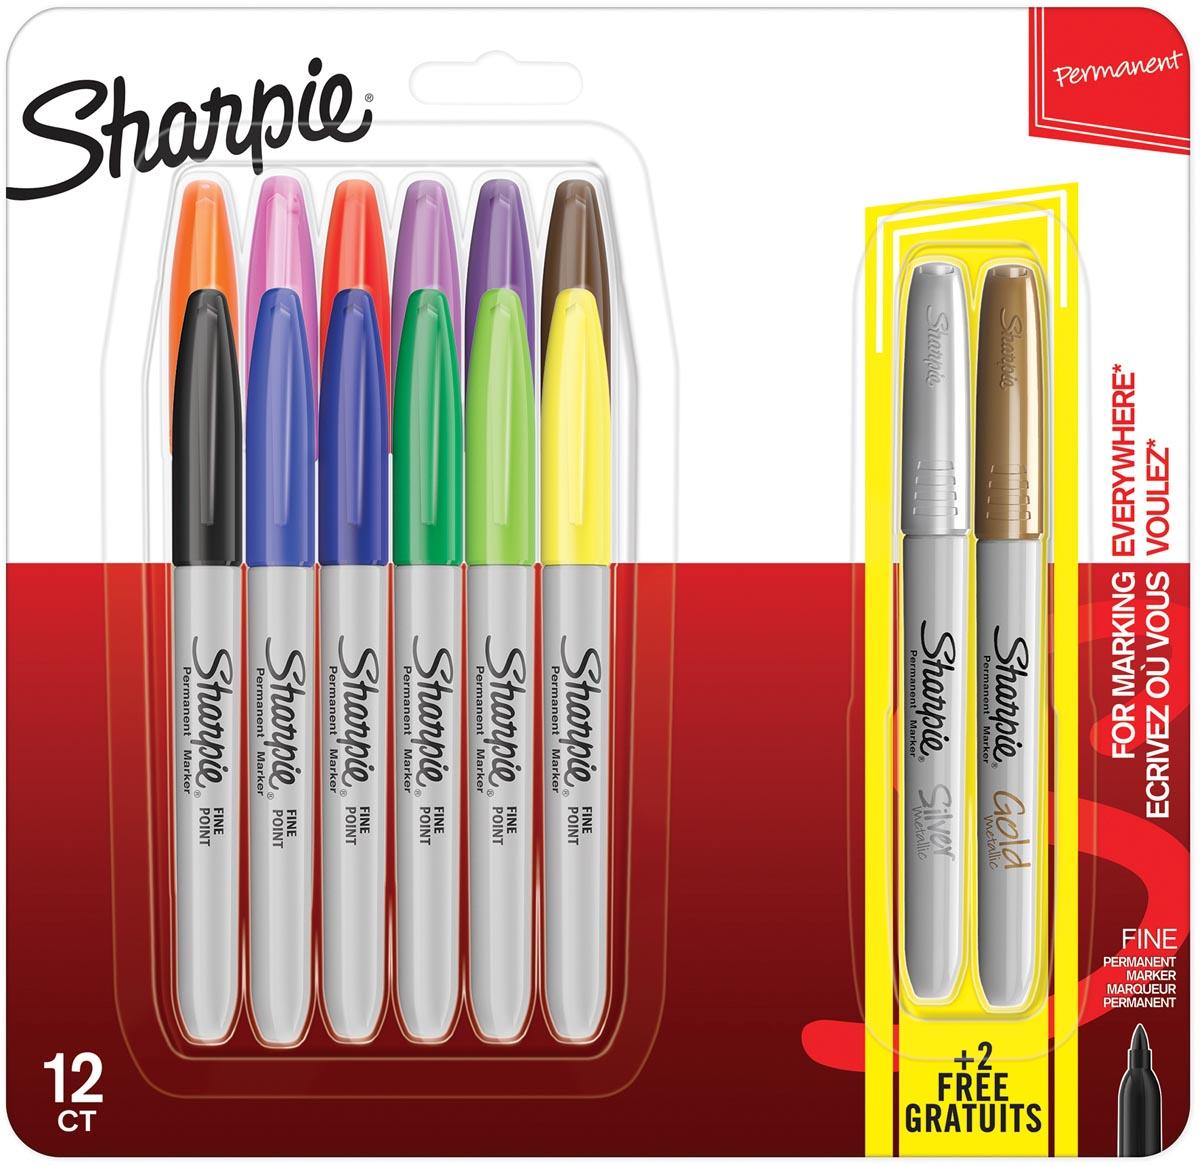 Sharpie permanente marker pastel, blister van 12 stuks + 2 GRATIS